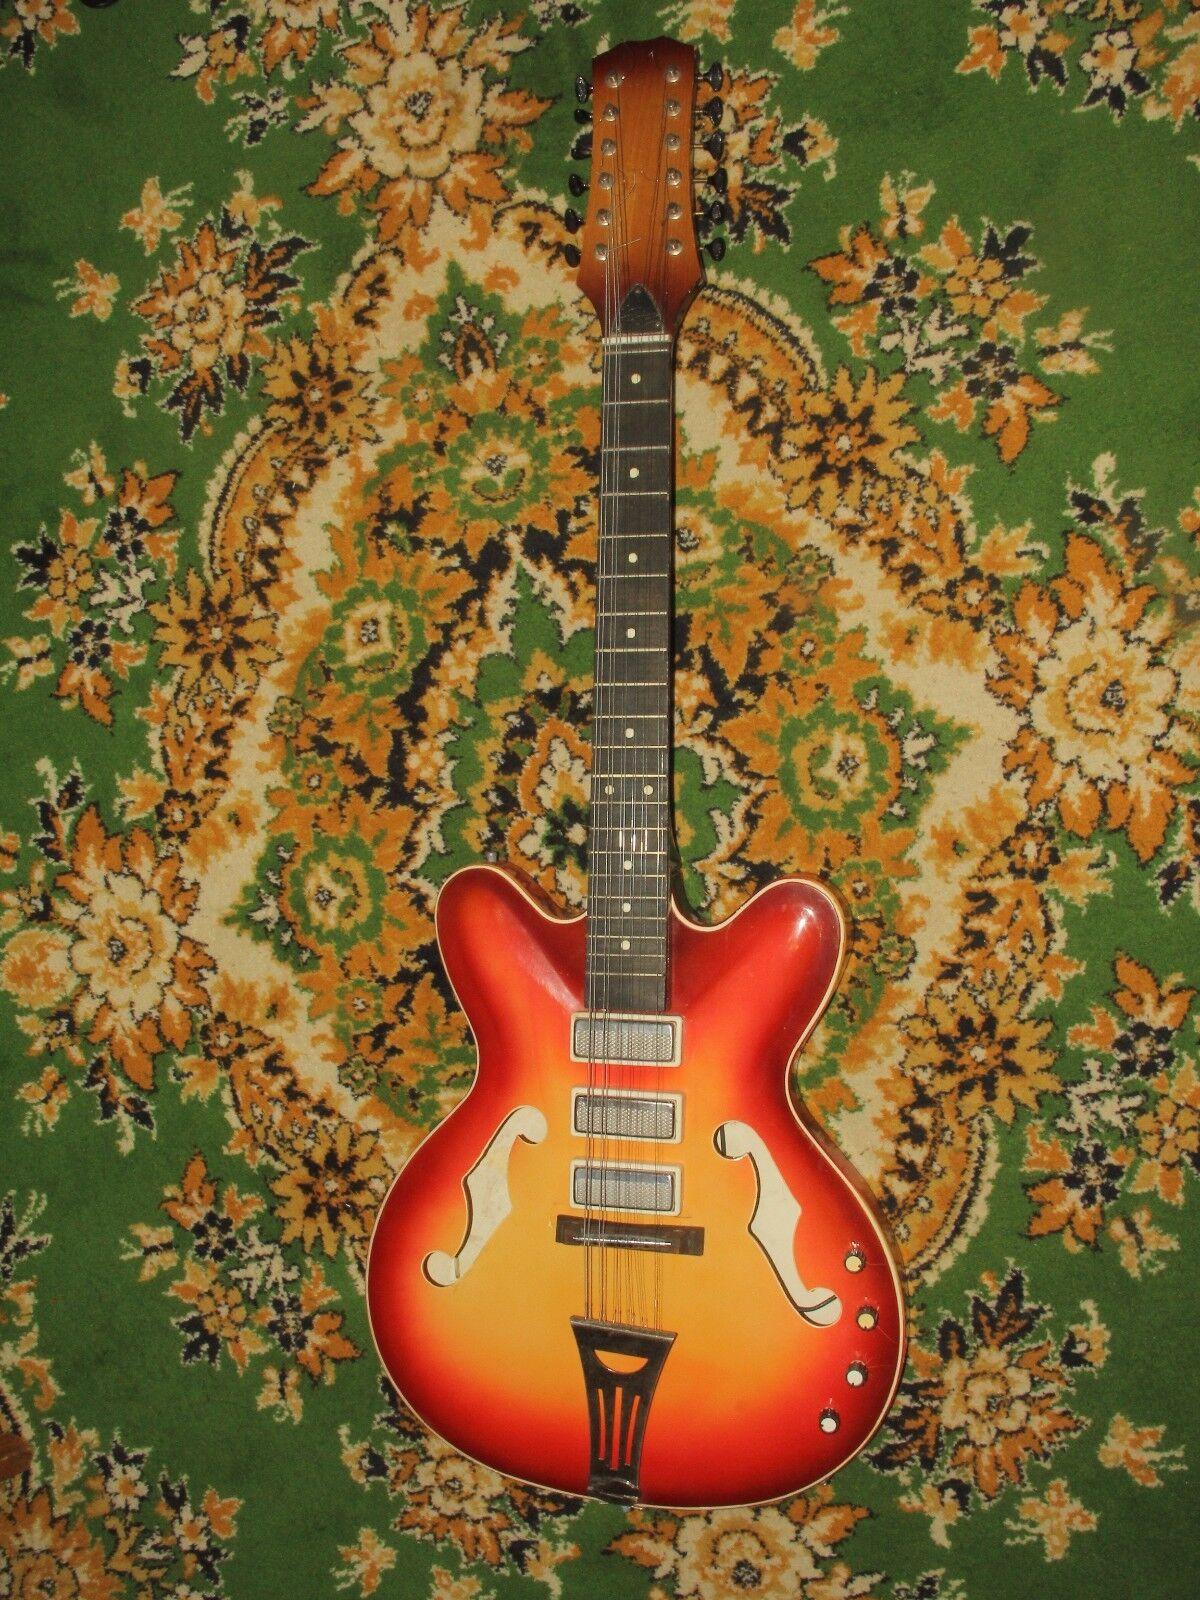 Maria Maria Maria URSS hueco de 12 Cuerdas Archtop 70s soviético Vintage Raro Gibson  conveniente